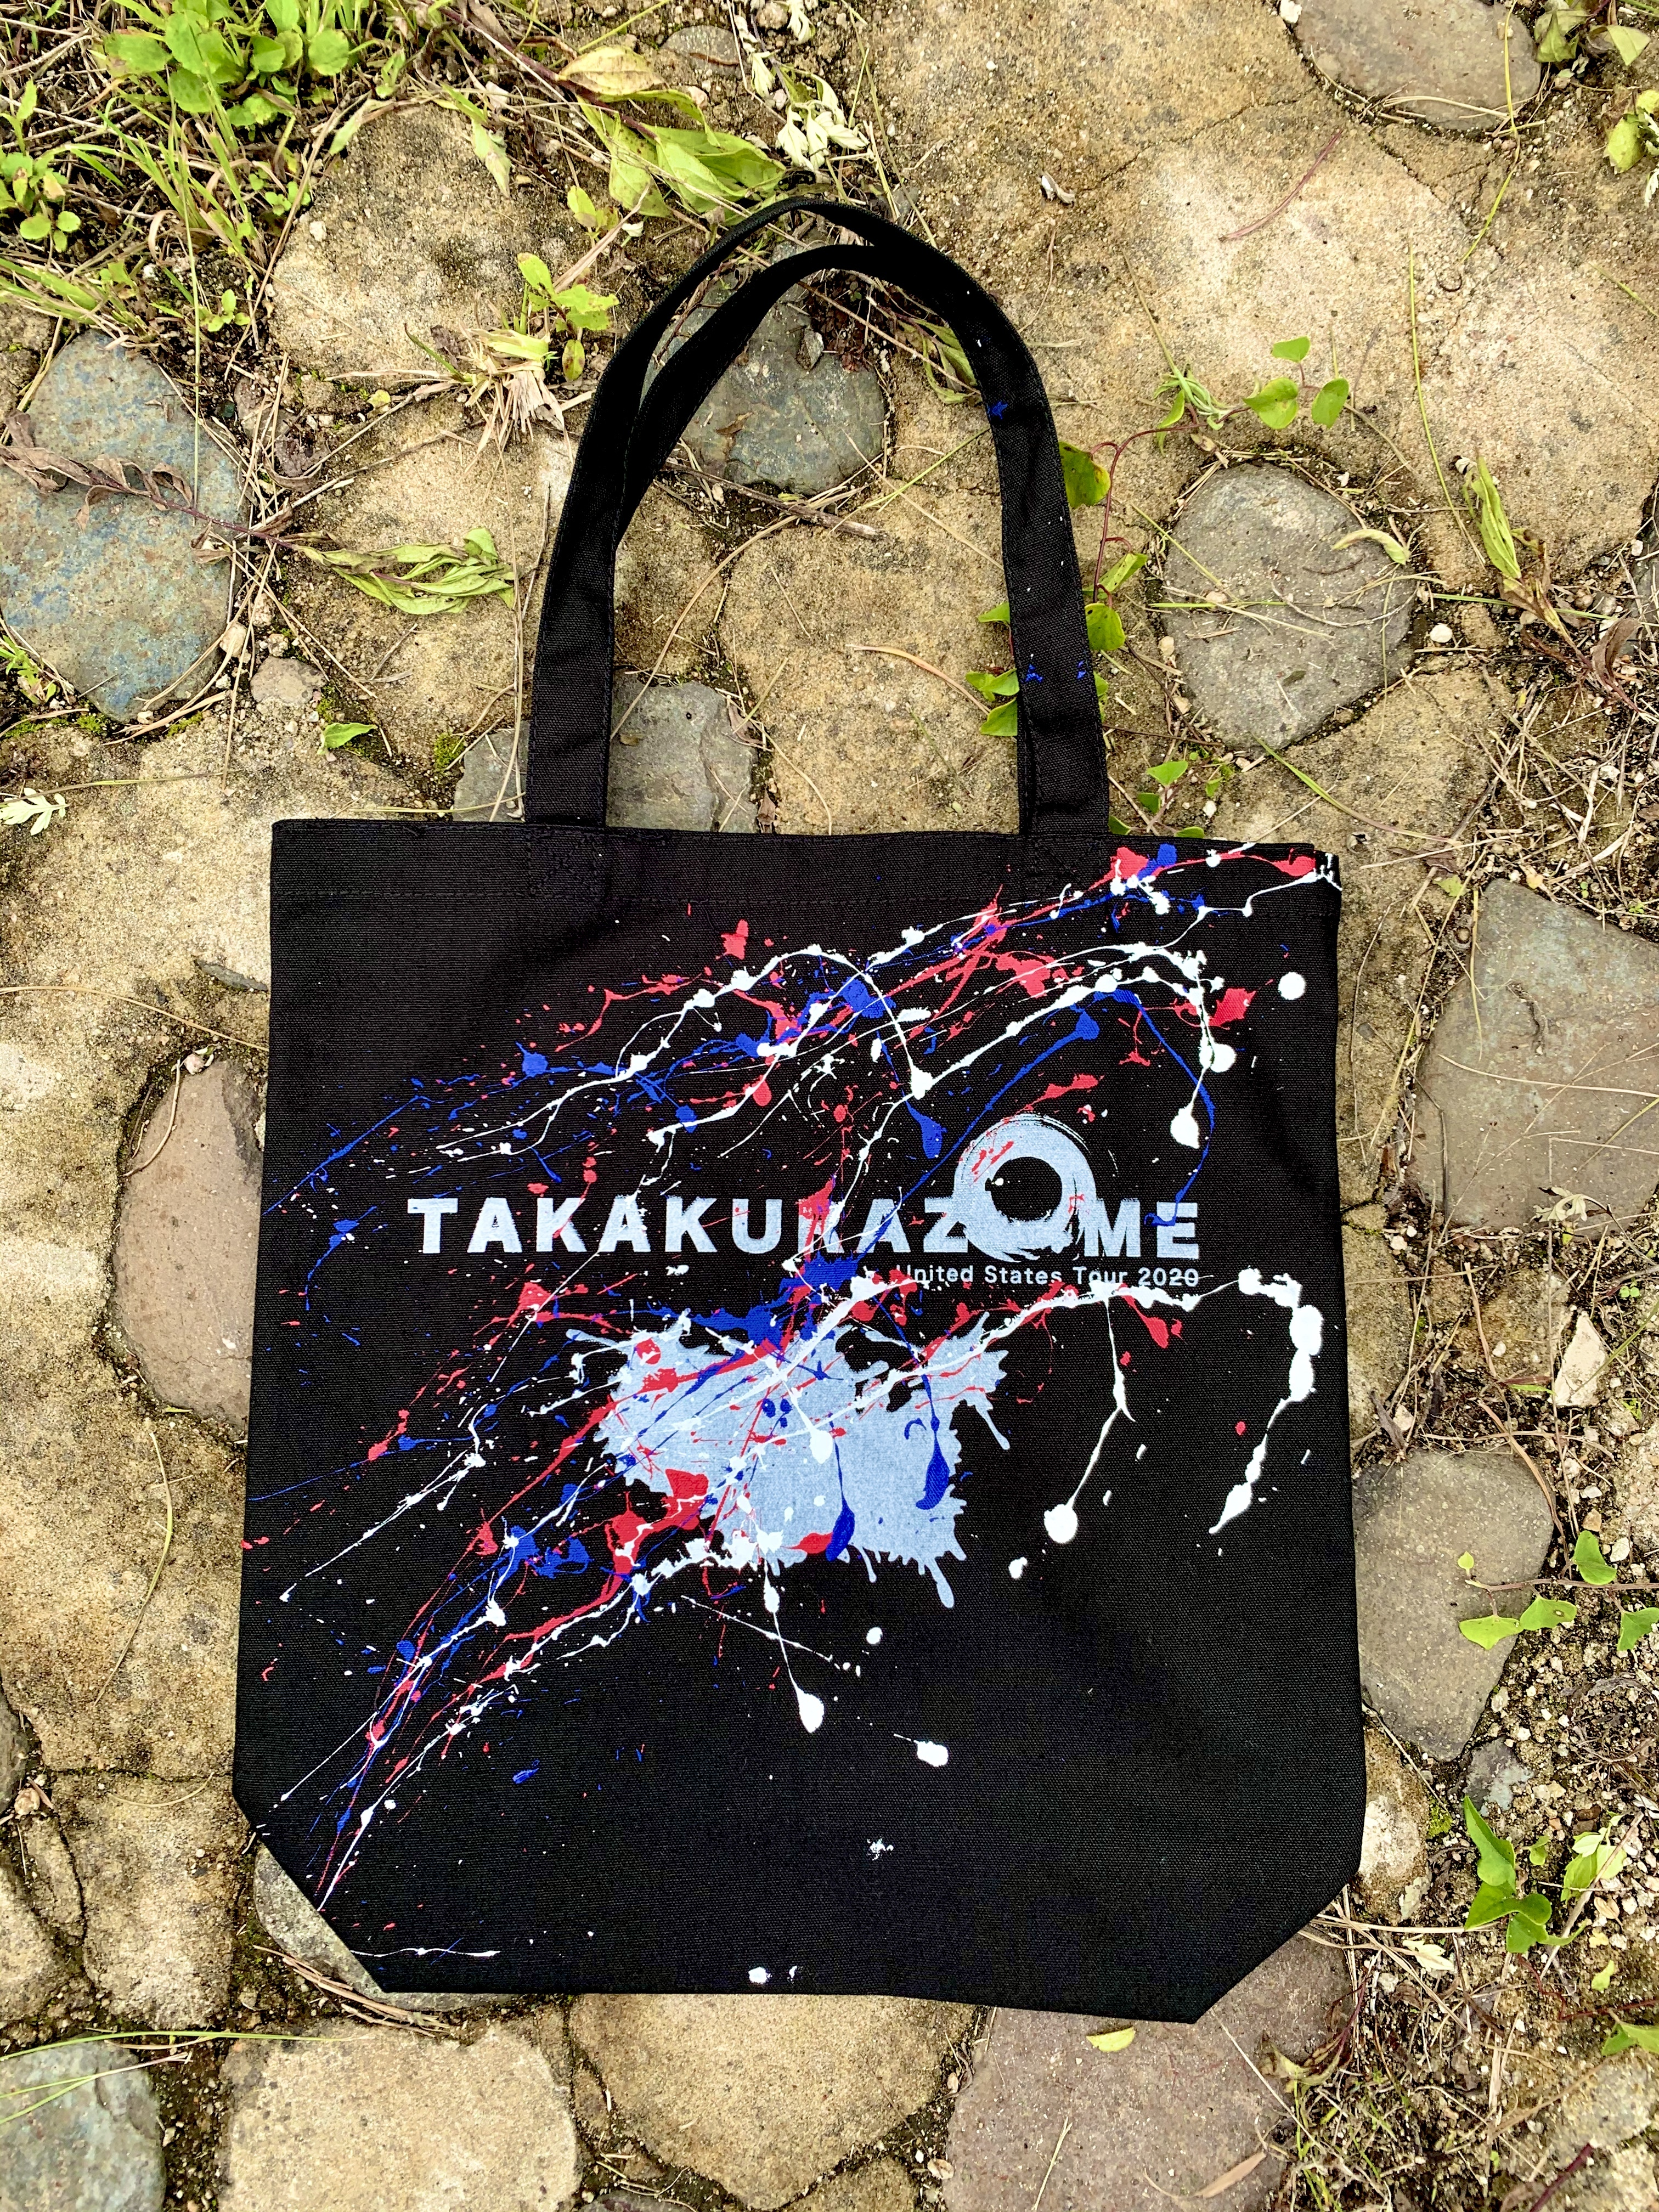 TAKAKURAZOME USツアートートバッグ(黒)